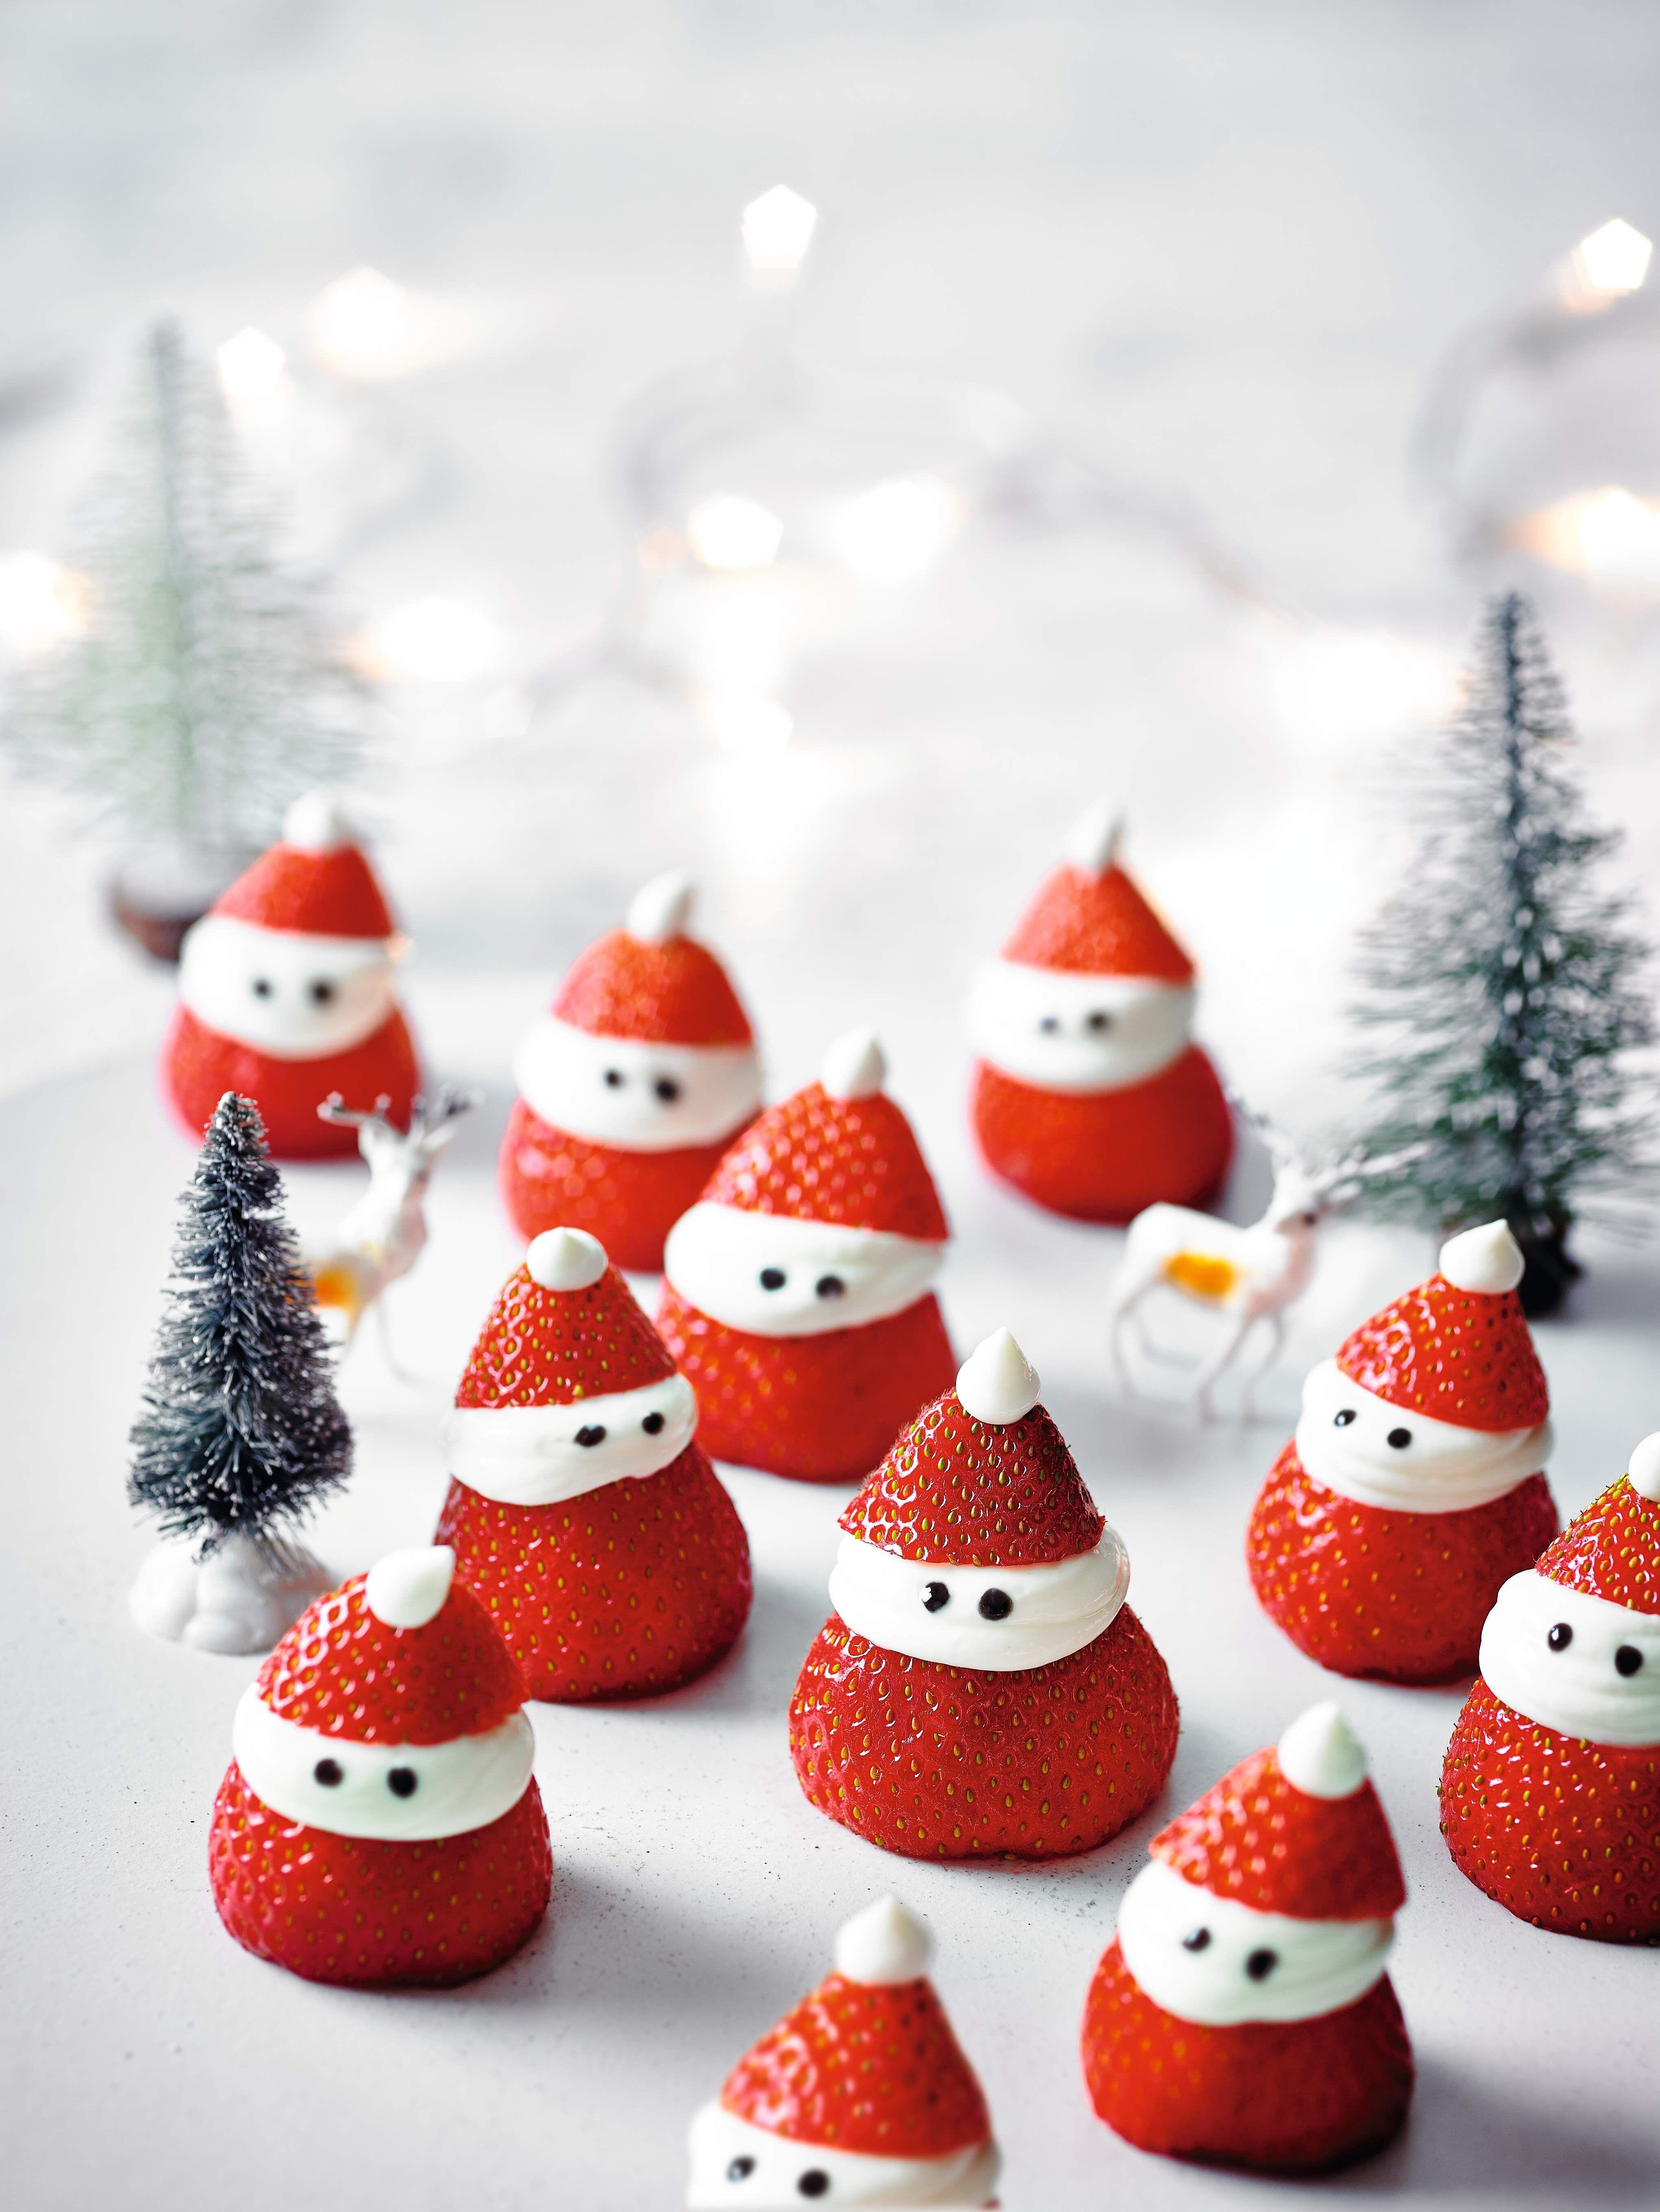 Strawberry Cheesecake Santas